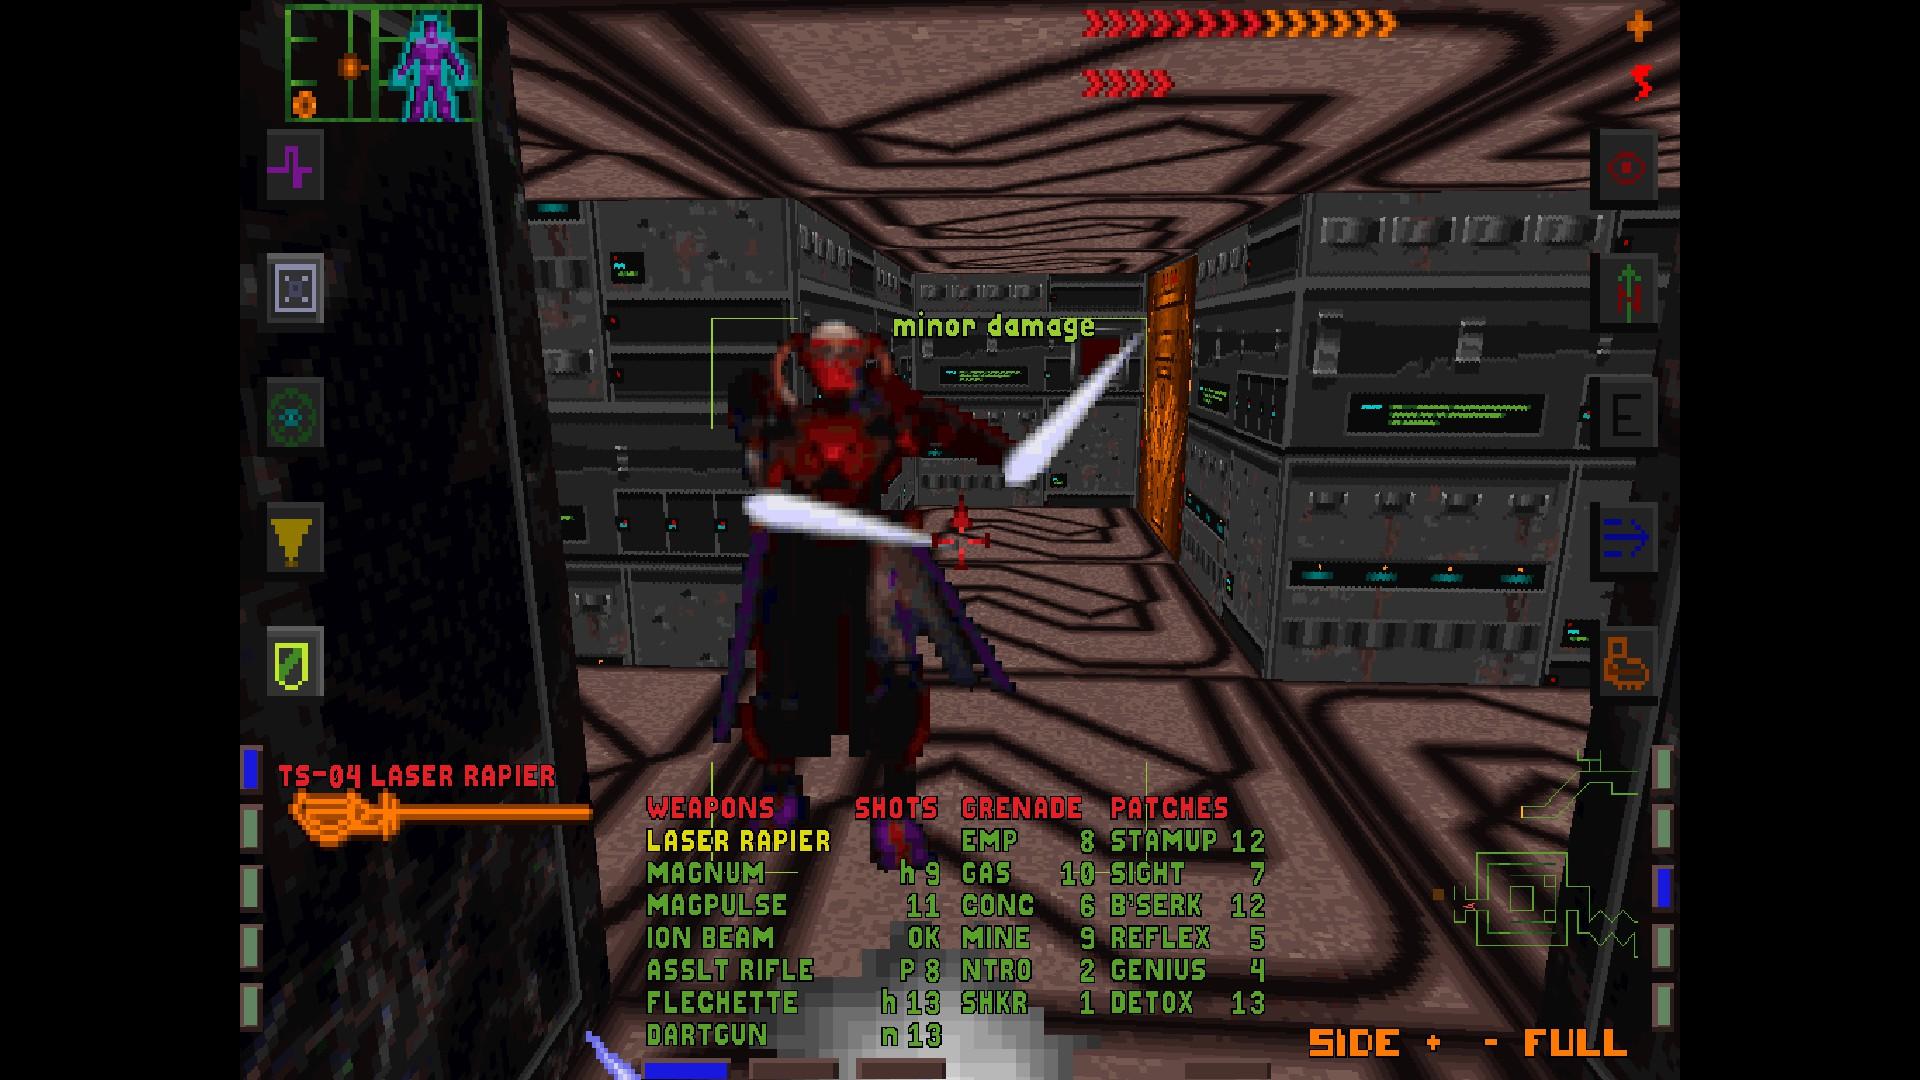 Rimejk System Shock igre nam dolazi u 2020 godini